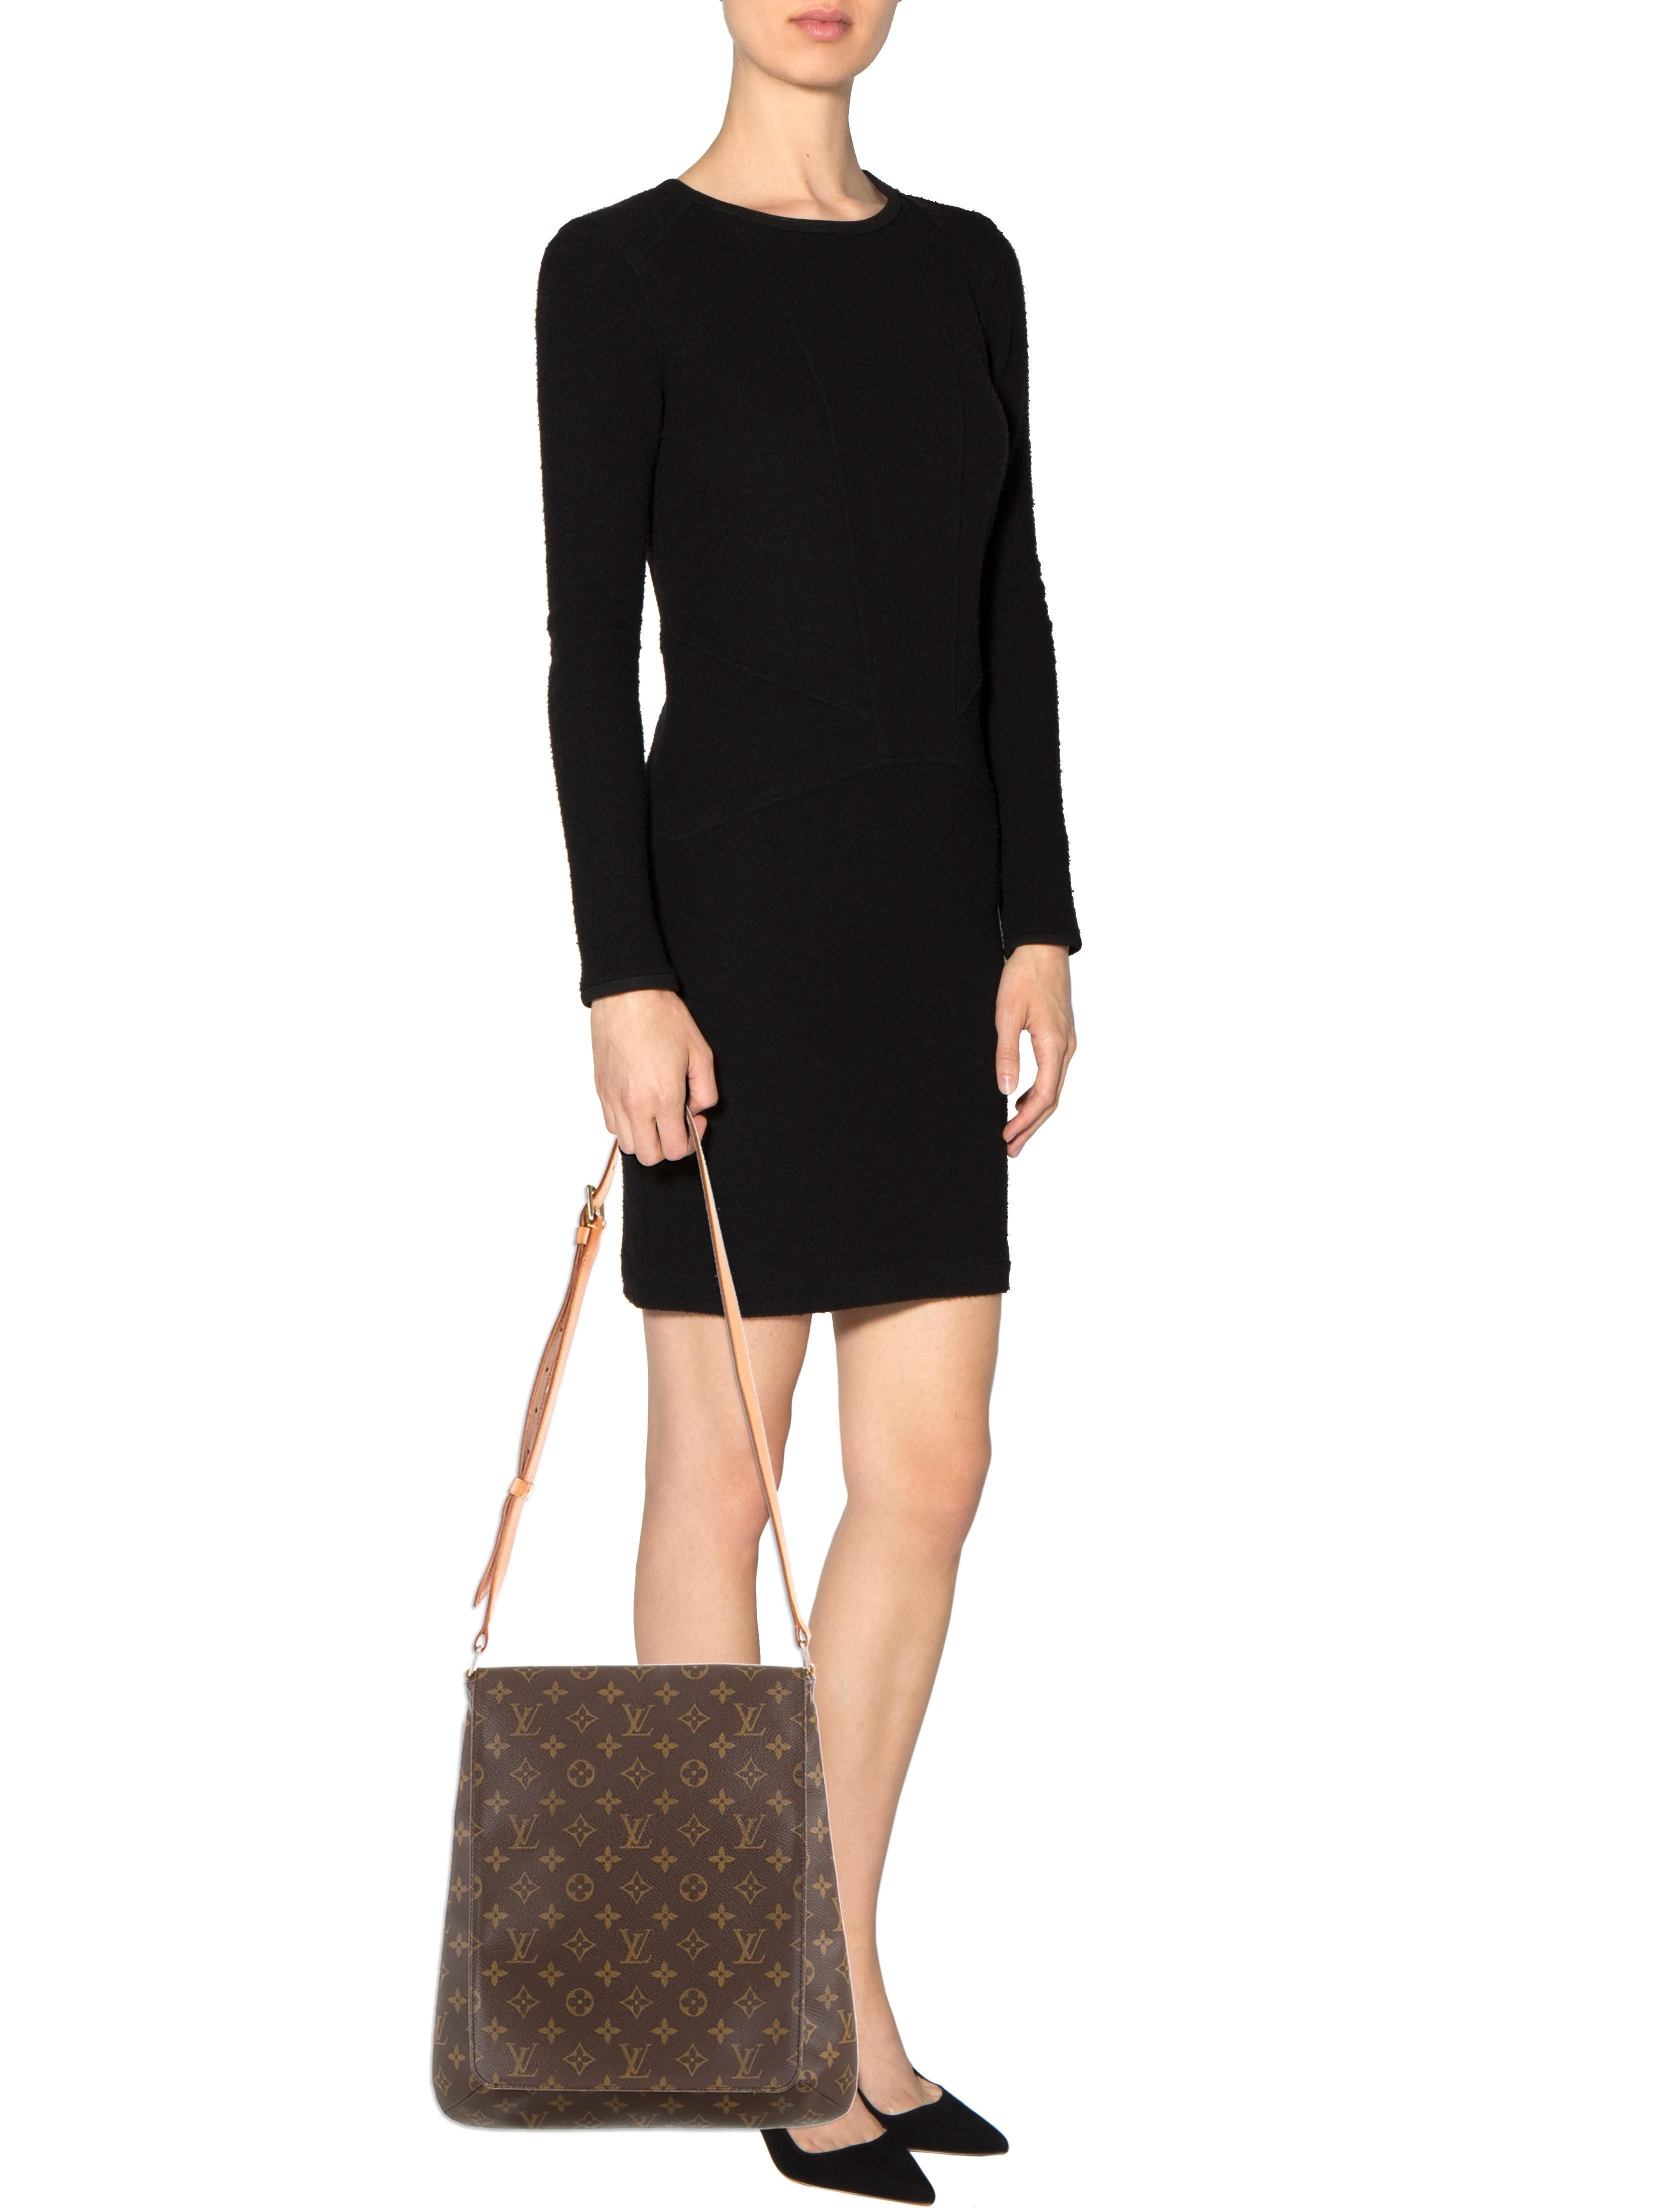 29273c293412 Louis Vuitton Musette Salsa Gm As1929 Brown Monogram Cross Body Bag. Get  the trendiest Cross Body Bag of the season! The Louis Vuitton Musette Salsa  Gm ...